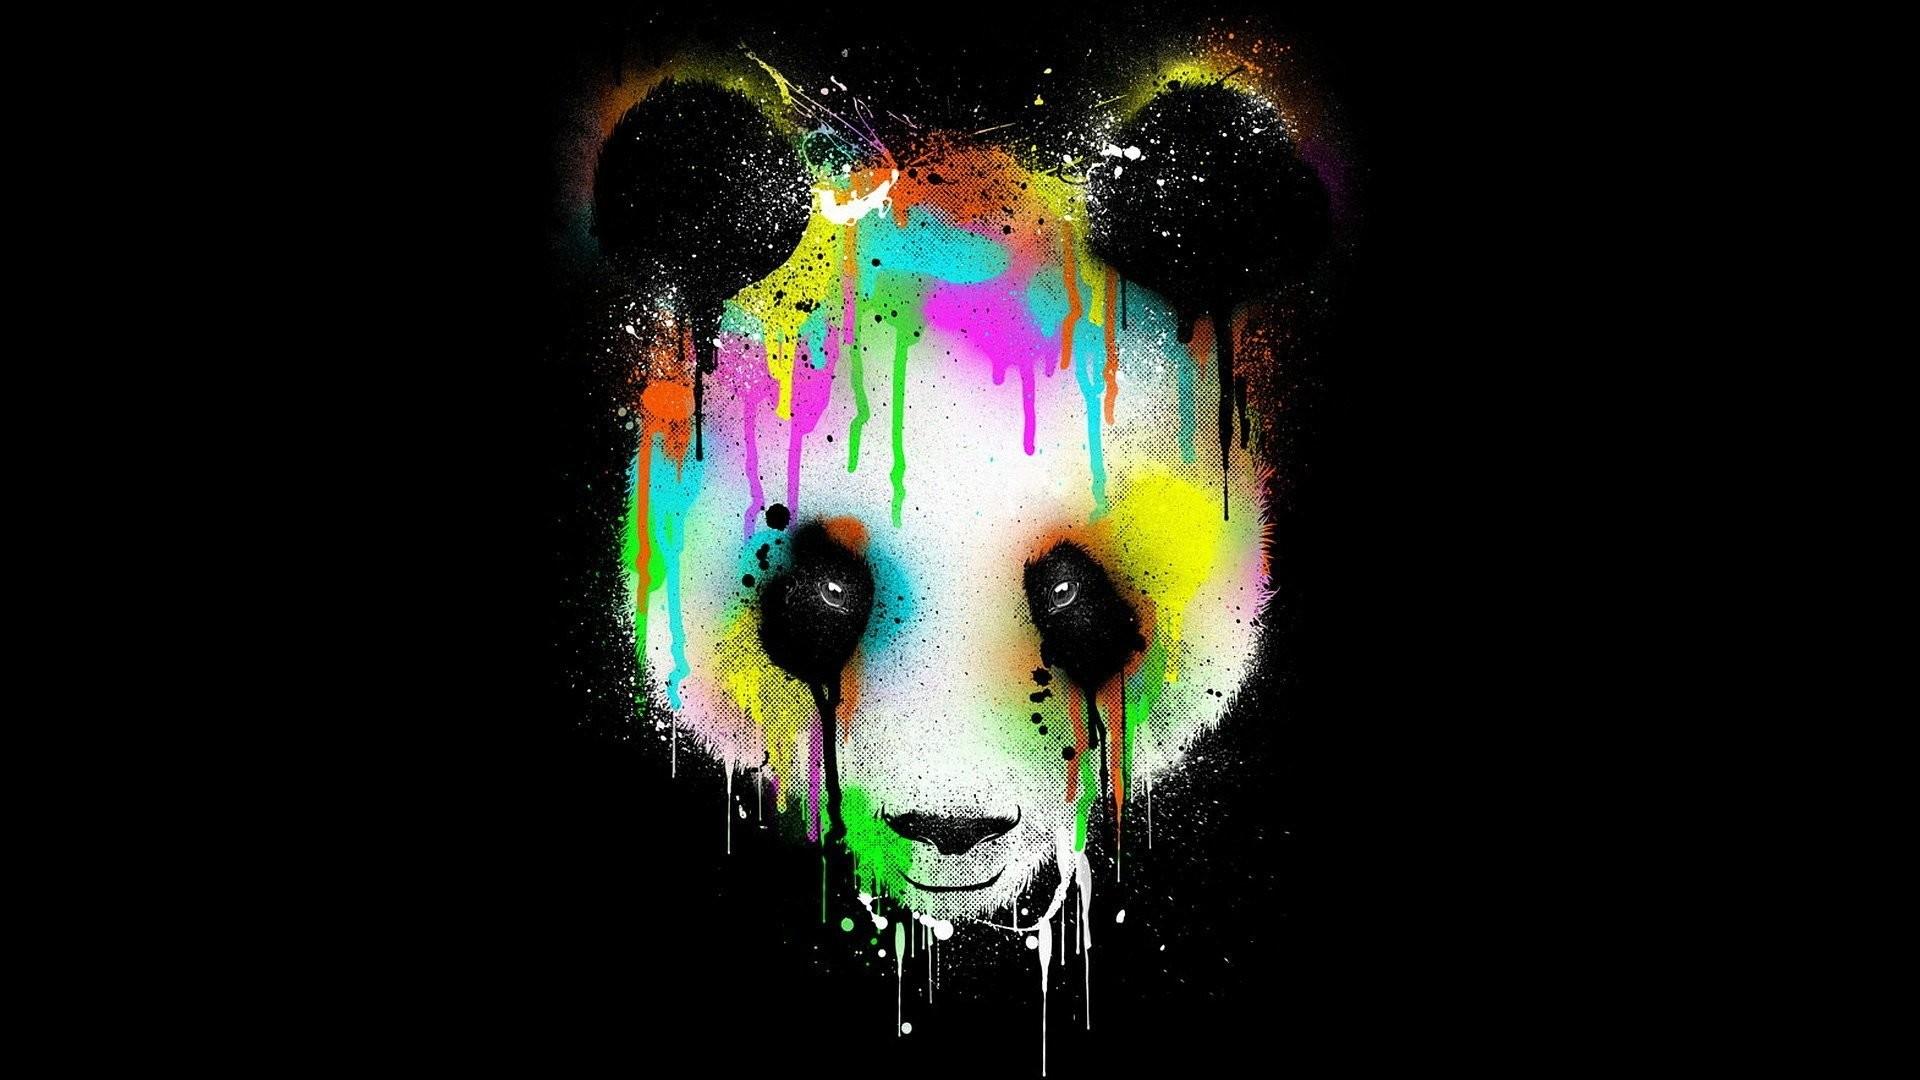 Fondo de pantalla HD | Fondo de Escritorio ID:524941. Animales  Panda